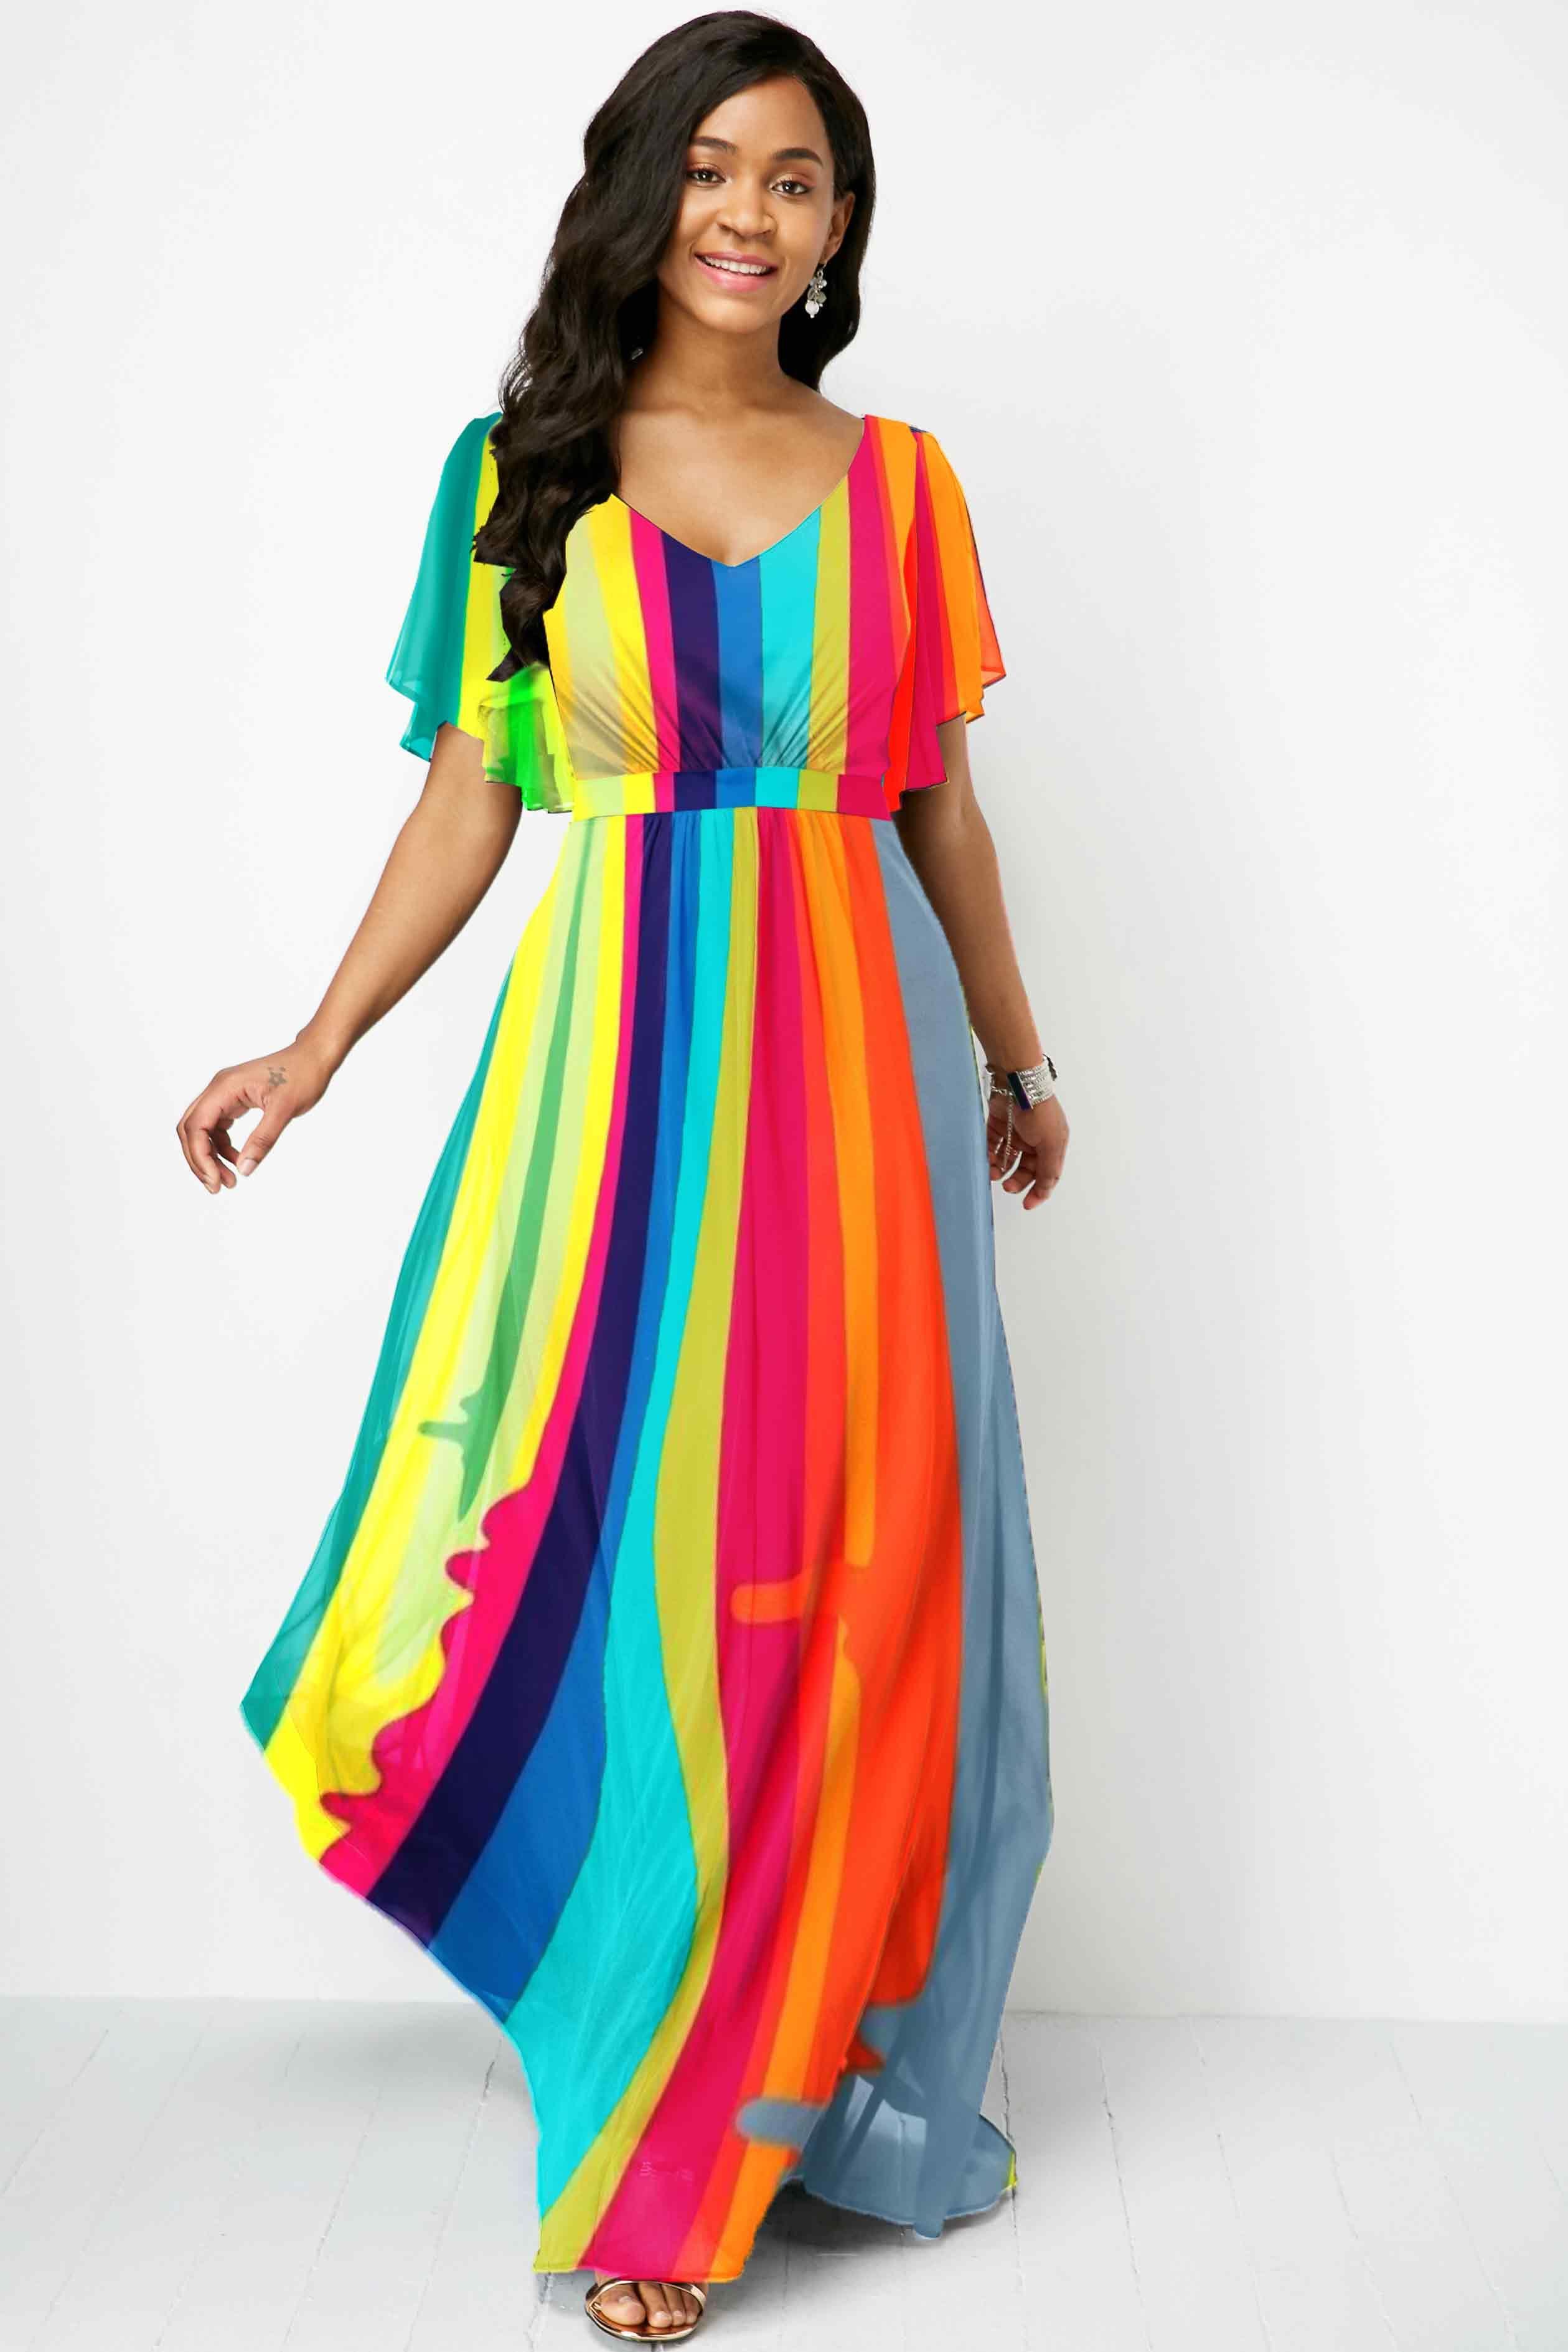 V Neck Multi Color Rainbow Striped Maxi Dress Ad Color Multi Neck Striped Maxi Dresses Maxi Dress Dress Stores Online [ 3778 x 2519 Pixel ]